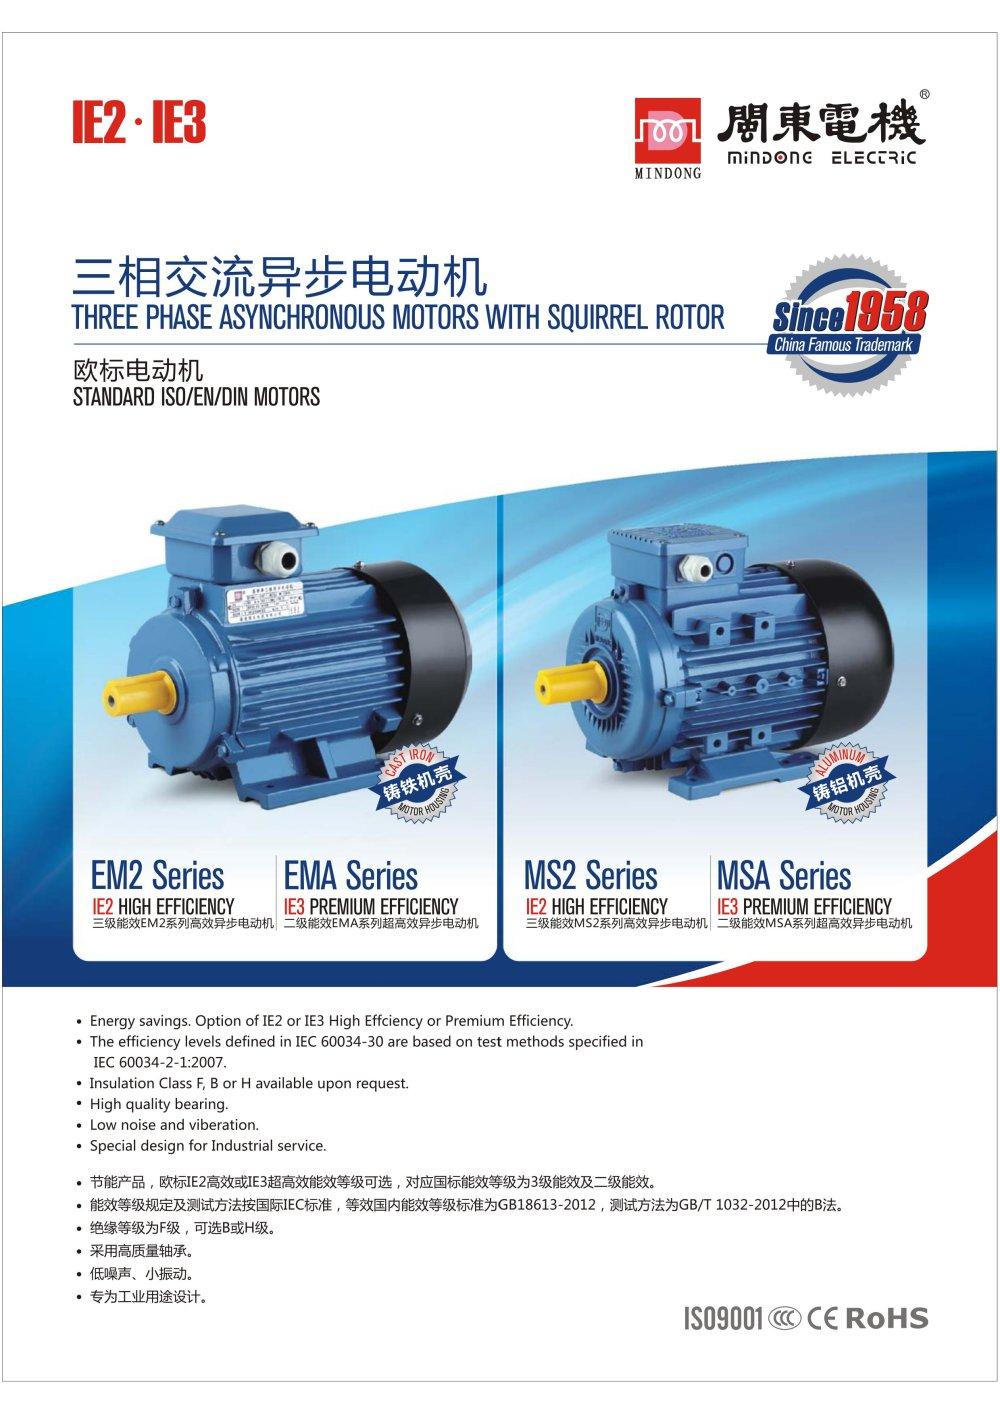 IE2/IE3 Electric Motor - Fujian Mindong Electric Co., Ltd. - PDF ...